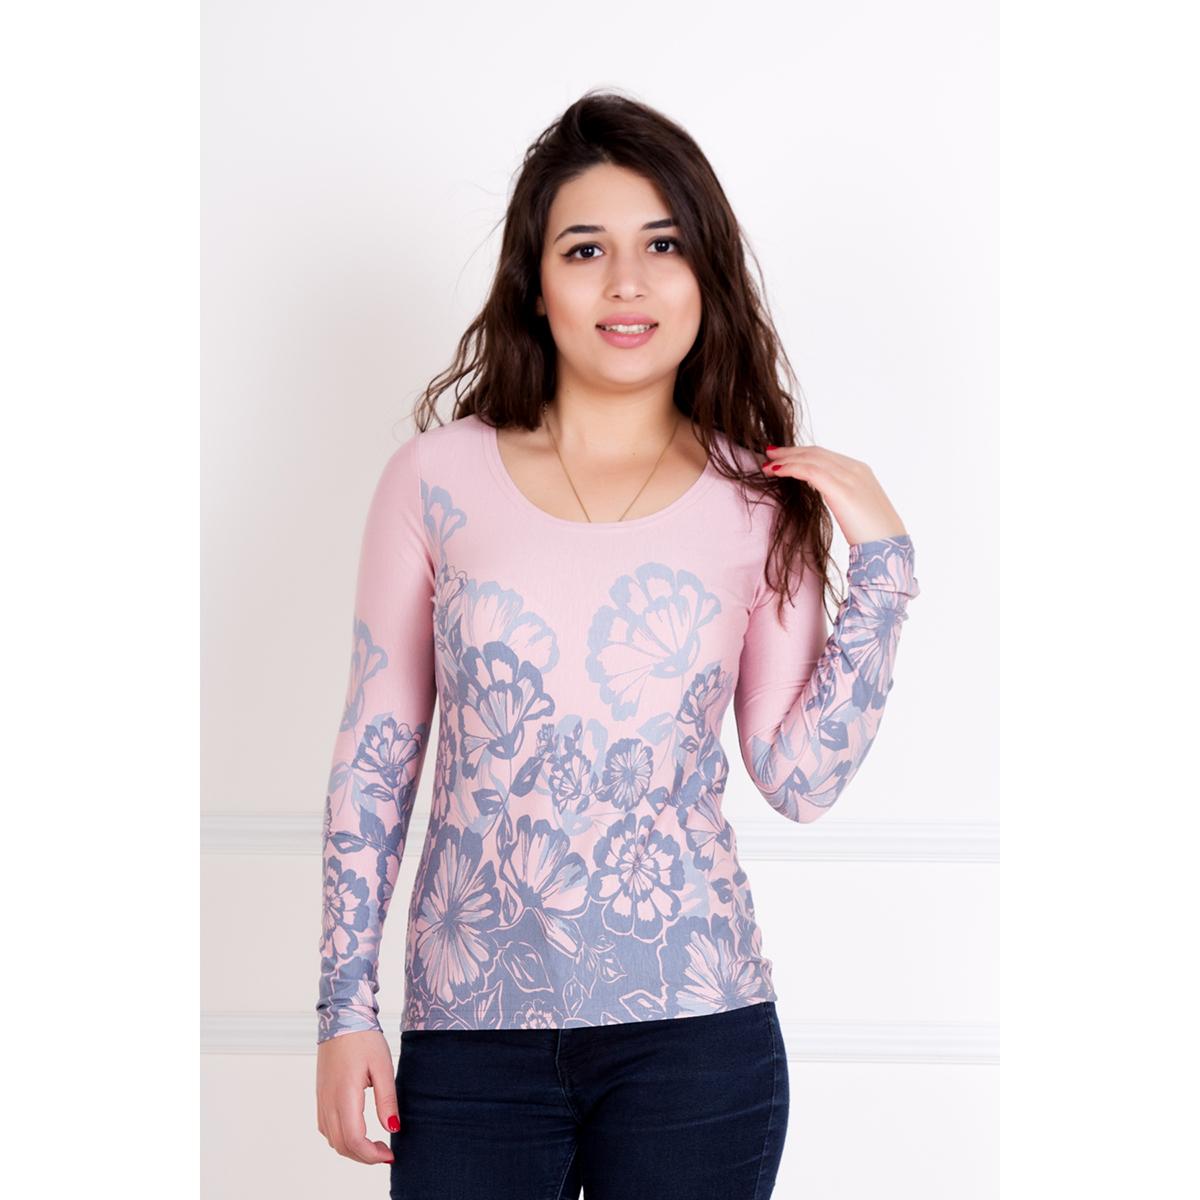 Женская блуза Лолита, размер 46Блузки, майки, кофты<br>Обхват груди:92 см<br>Обхват талии:74 см<br>Обхват бедер:100 см<br>Рост:167 см<br><br>Тип: Жен. блуза<br>Размер: 46<br>Материал: Вискоза